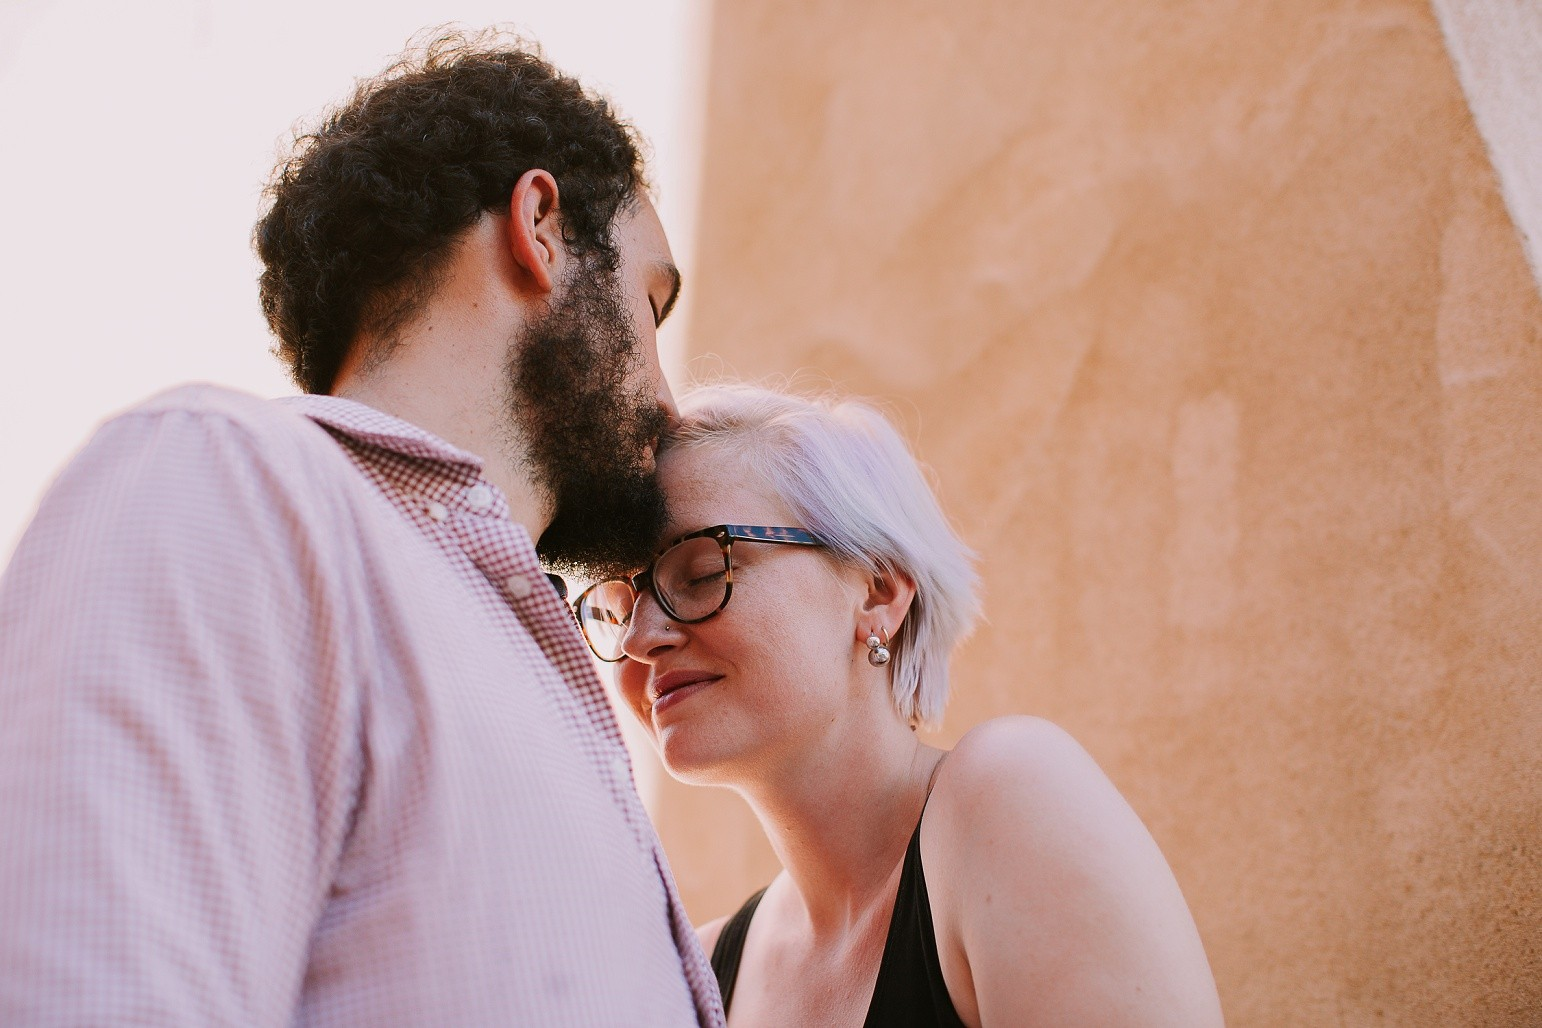 kateryna-photos-mariage-photographe-pornic-bretagne-nantes-couple-engagement-love-story-le-mans-wedding_0206.jpg